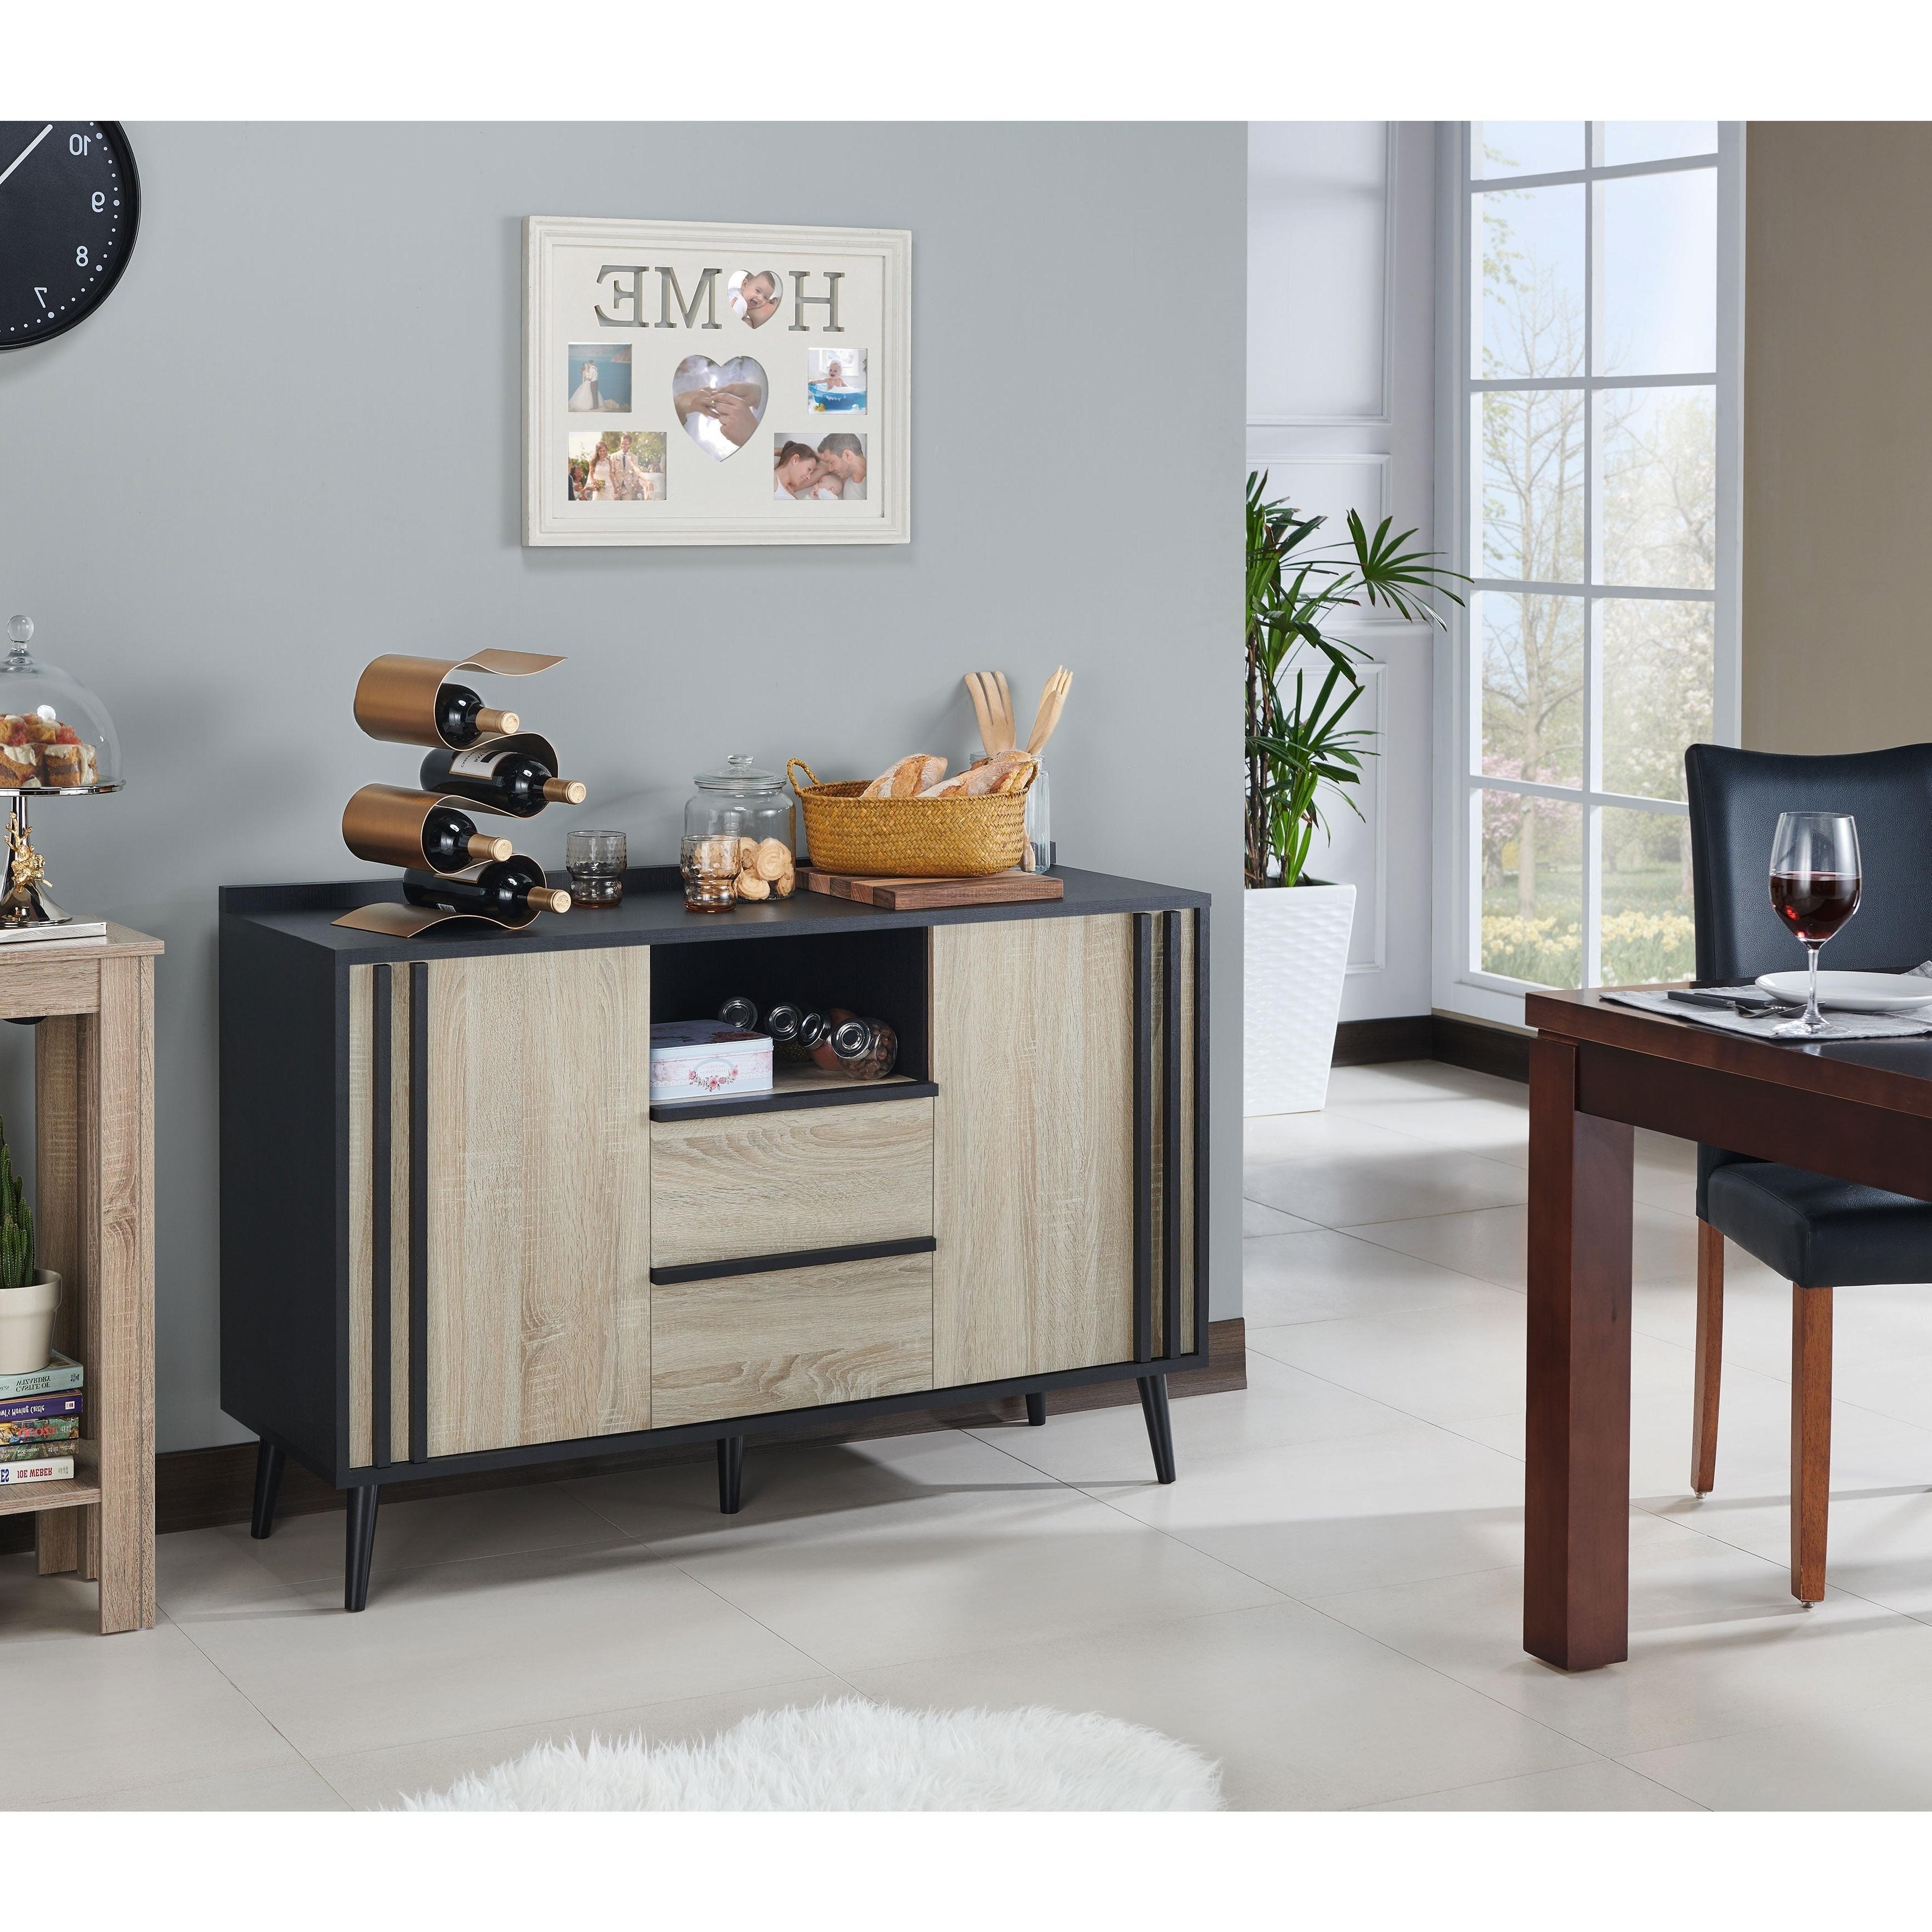 Mandal Mid Century Modern White Oak Buffet Serverfoa Regarding Light White Oak Two Tone Modern Buffets (View 17 of 20)